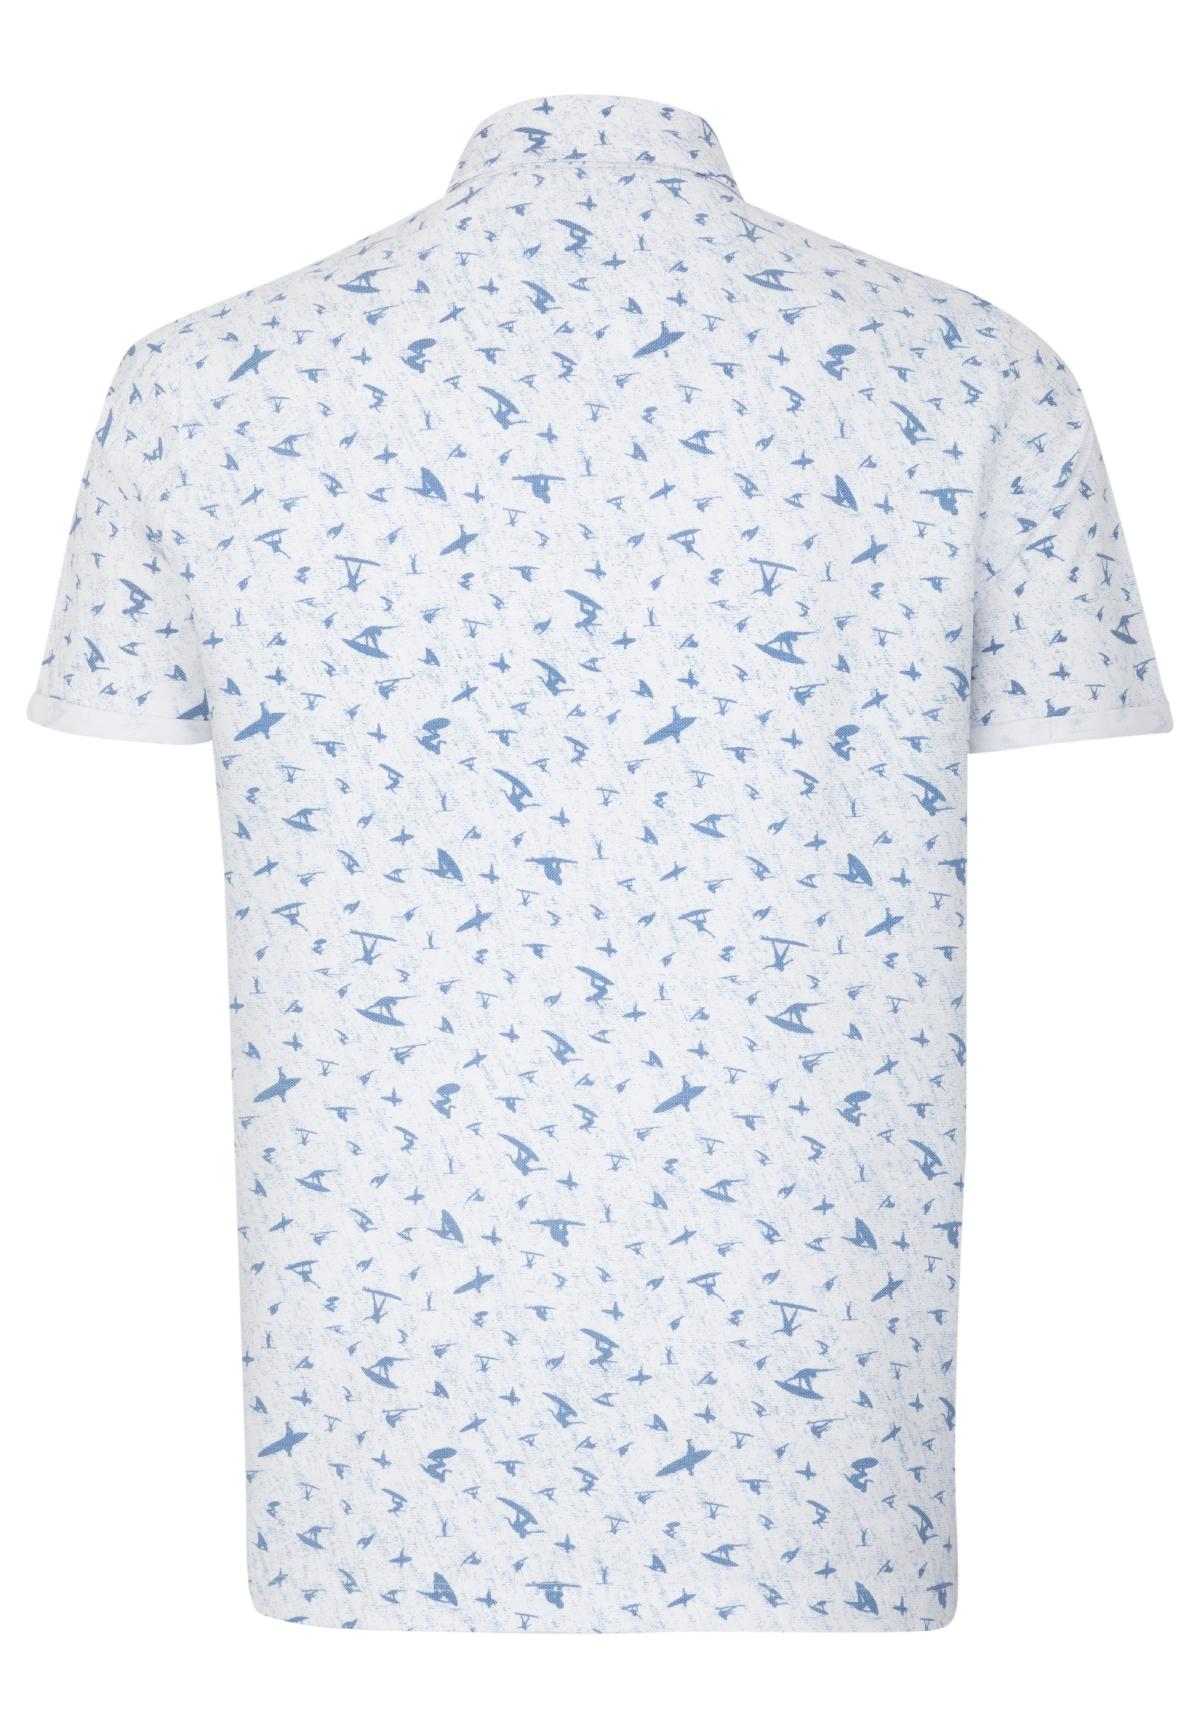 Camel-Active-Herren-Shirt-Poloshirt-Pique-Regular-Fit-NEU Indexbild 8